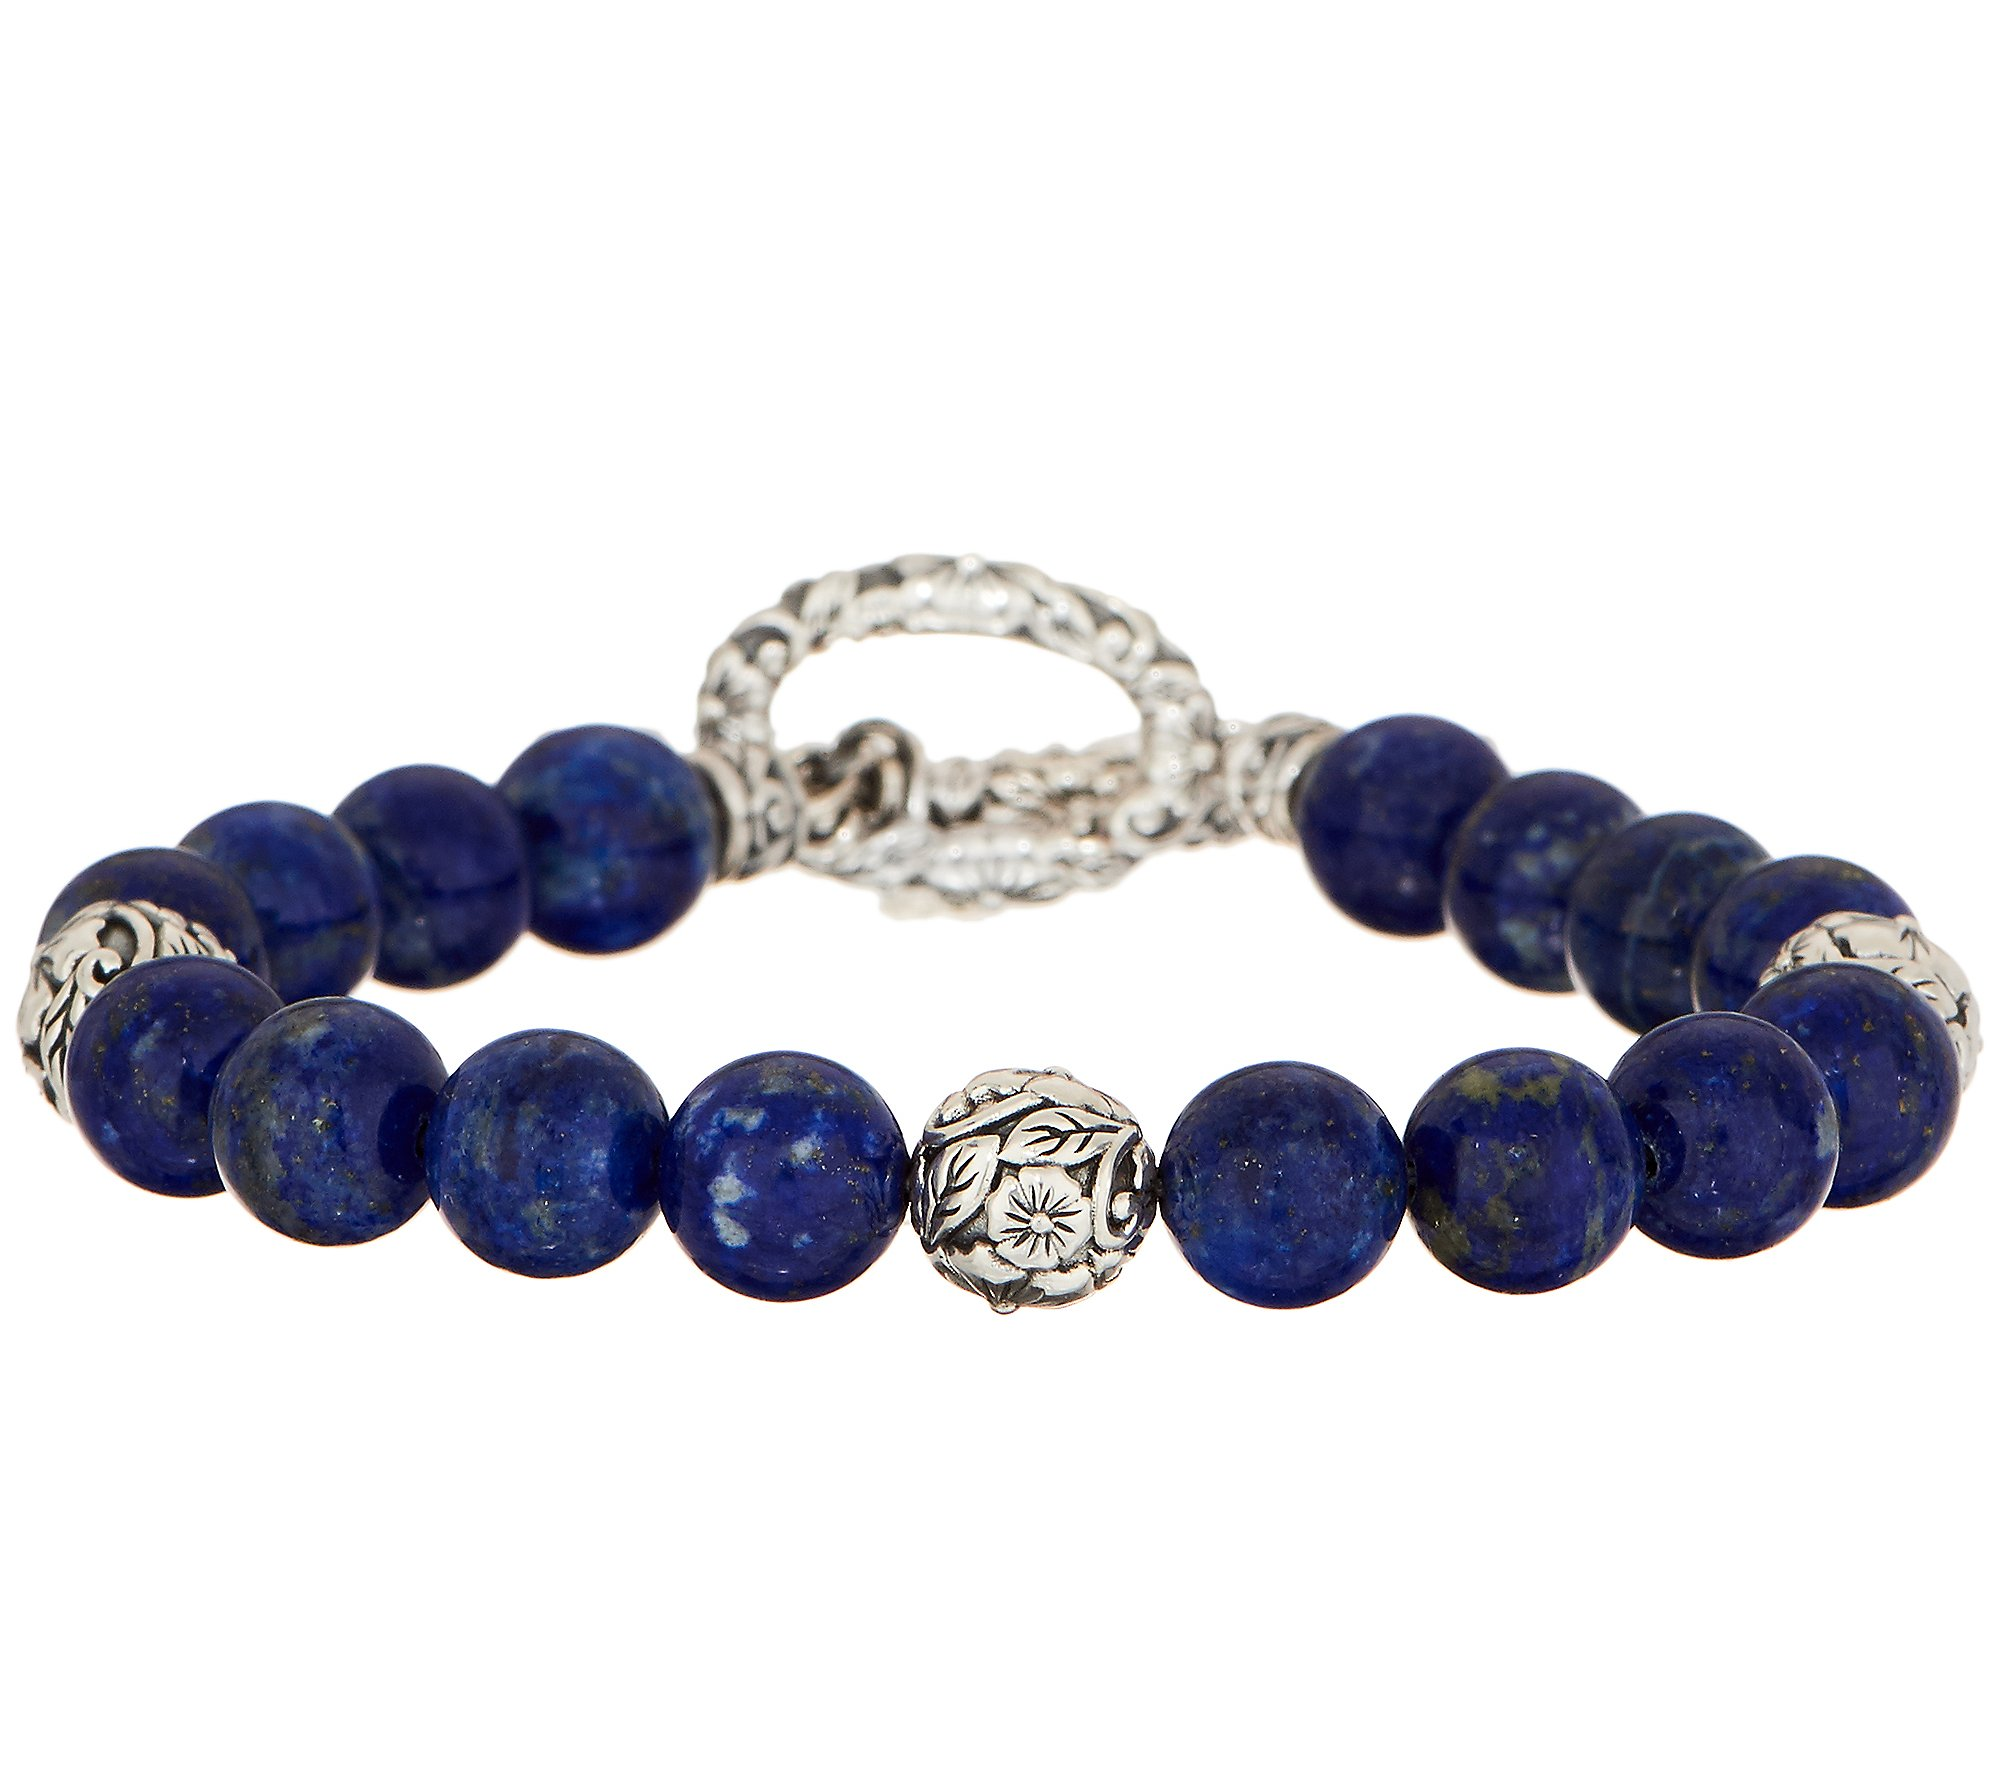 Sterling Silver Cuff Bracelet Polka Dot Turquoise Lapis Lazuli